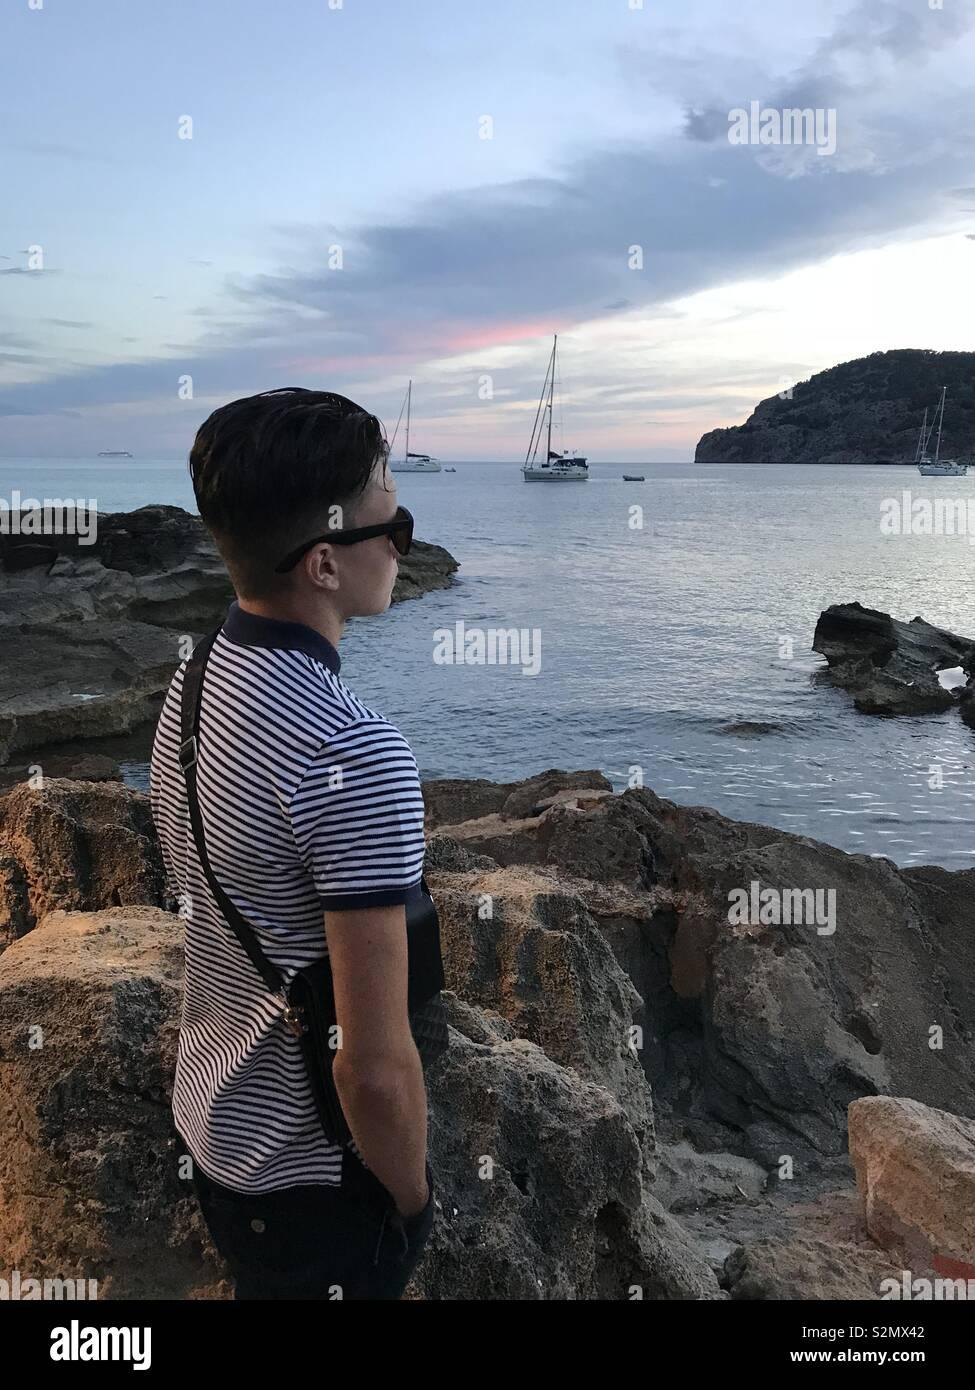 My son in camp de mar - Stock Image